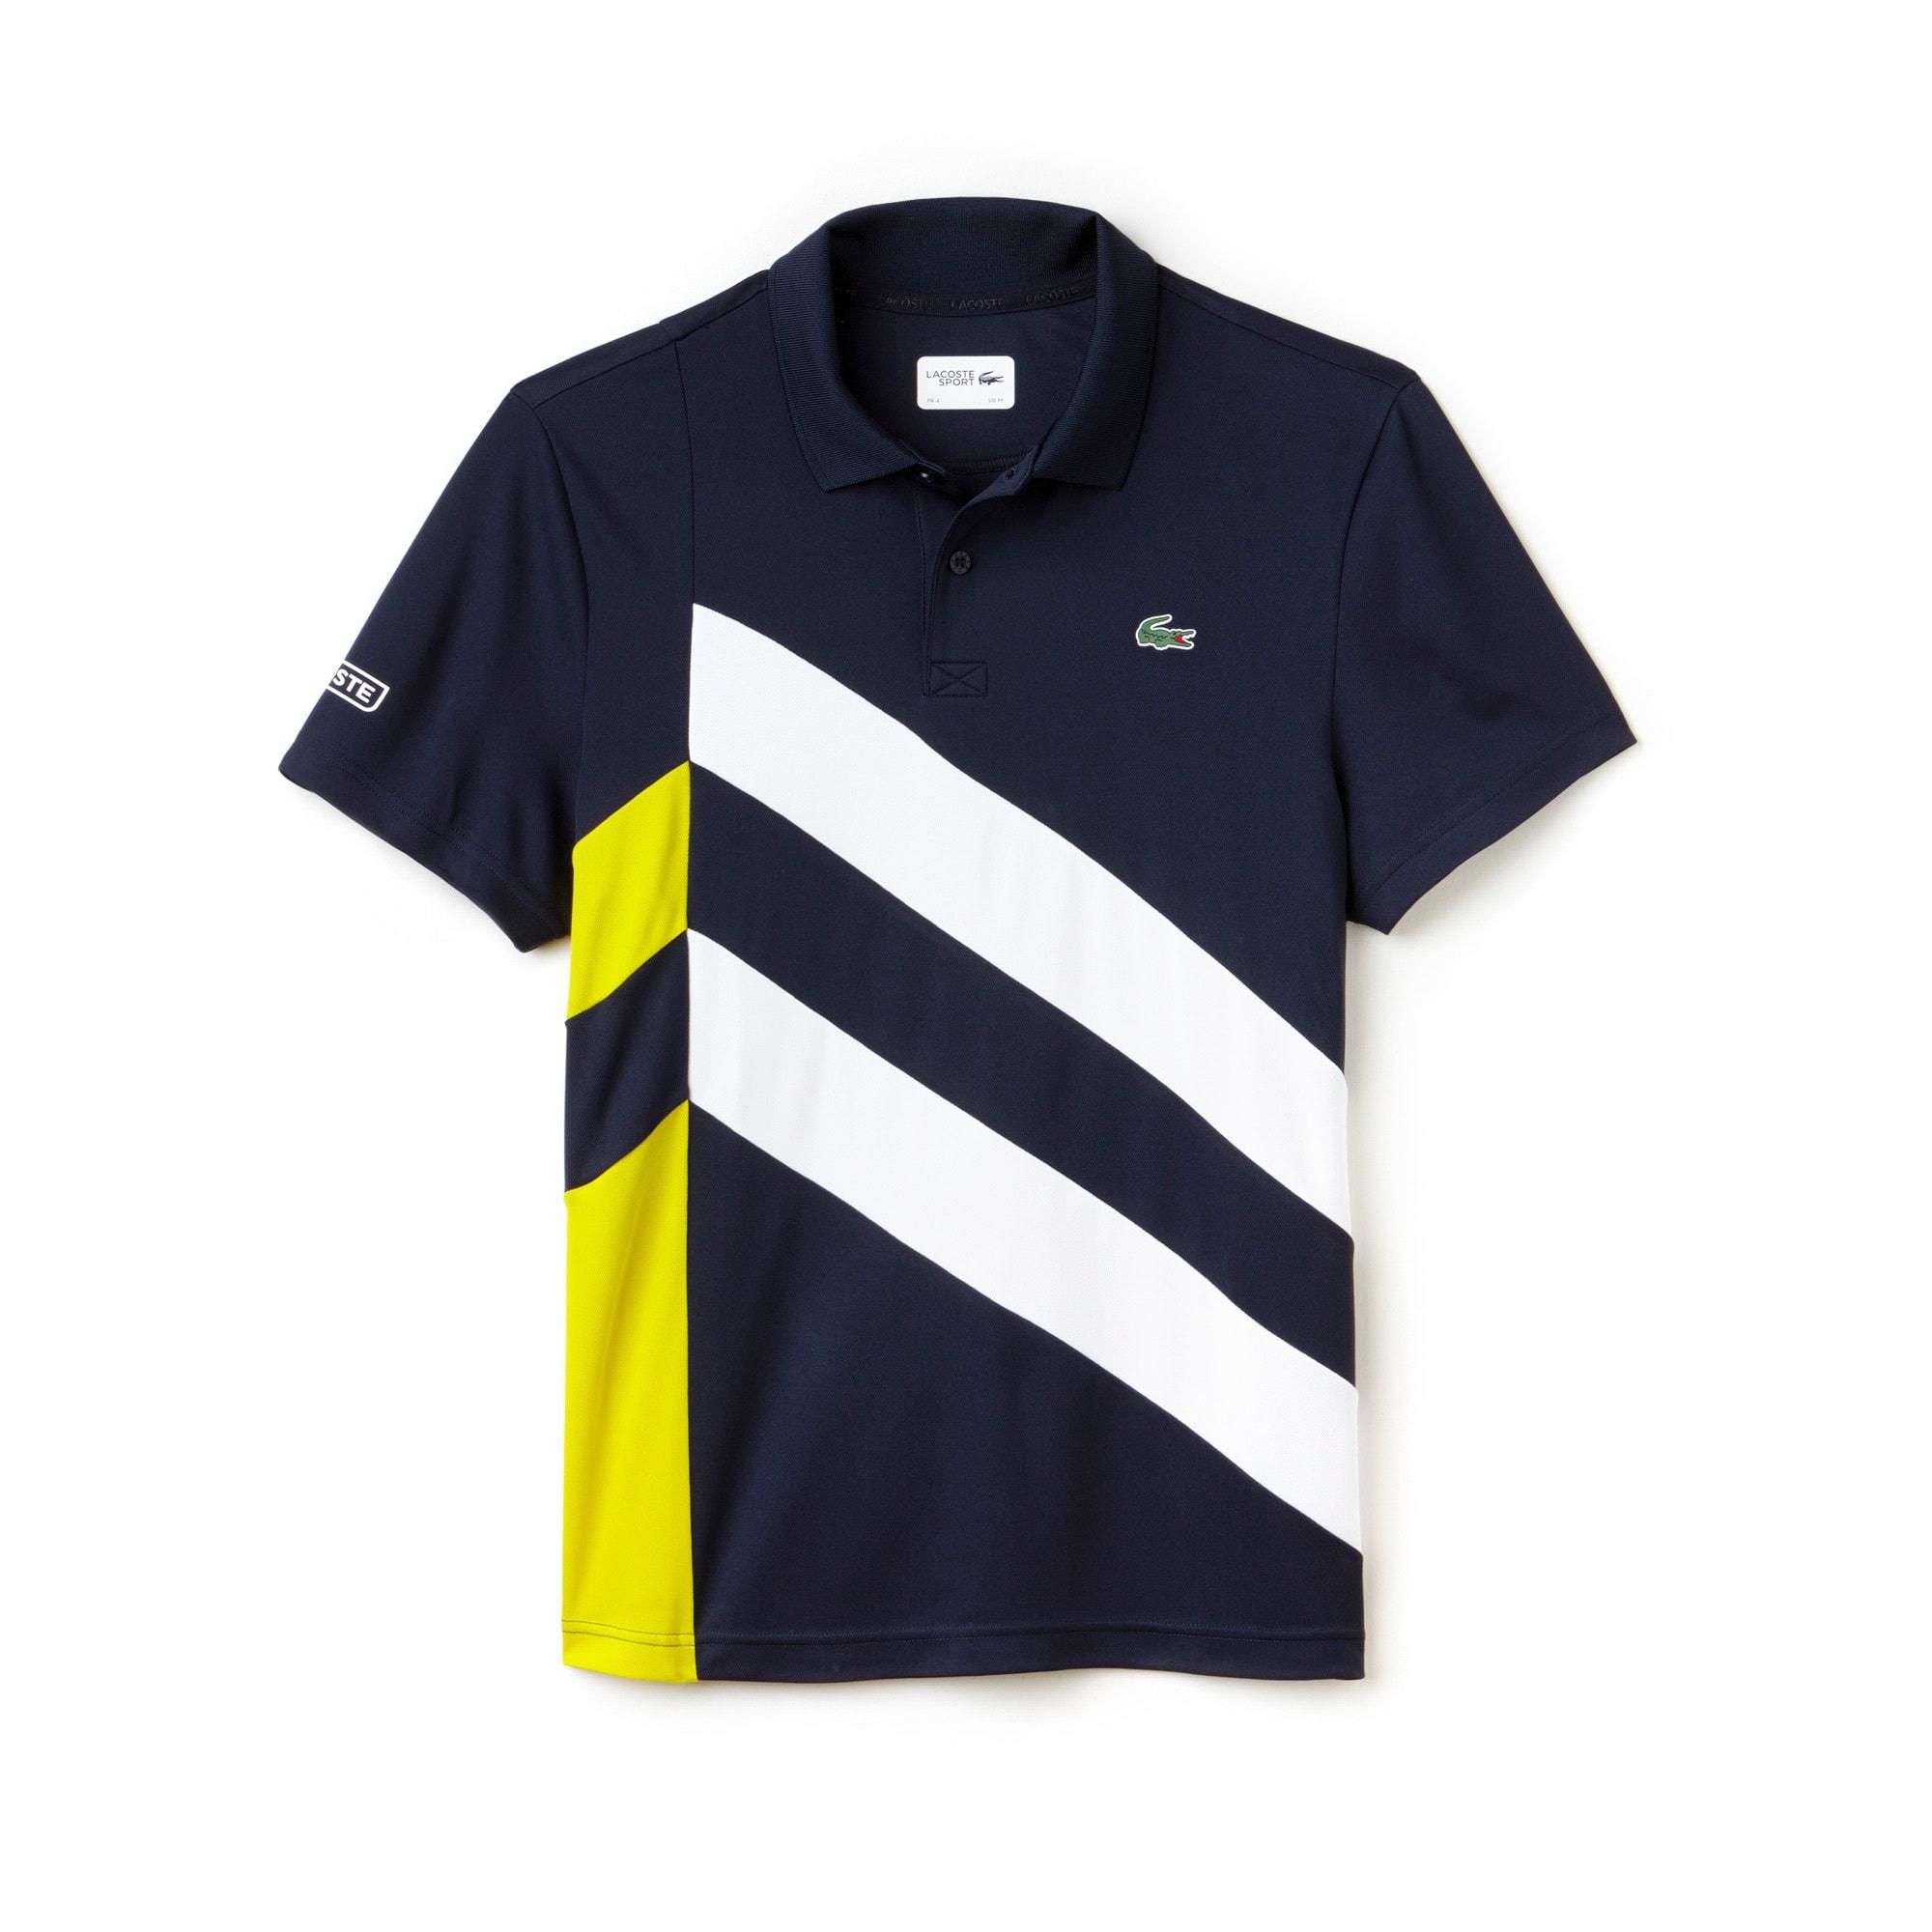 Herren-Funktions-Polo mit Colorblockband LACOSTE SPORT TENNIS